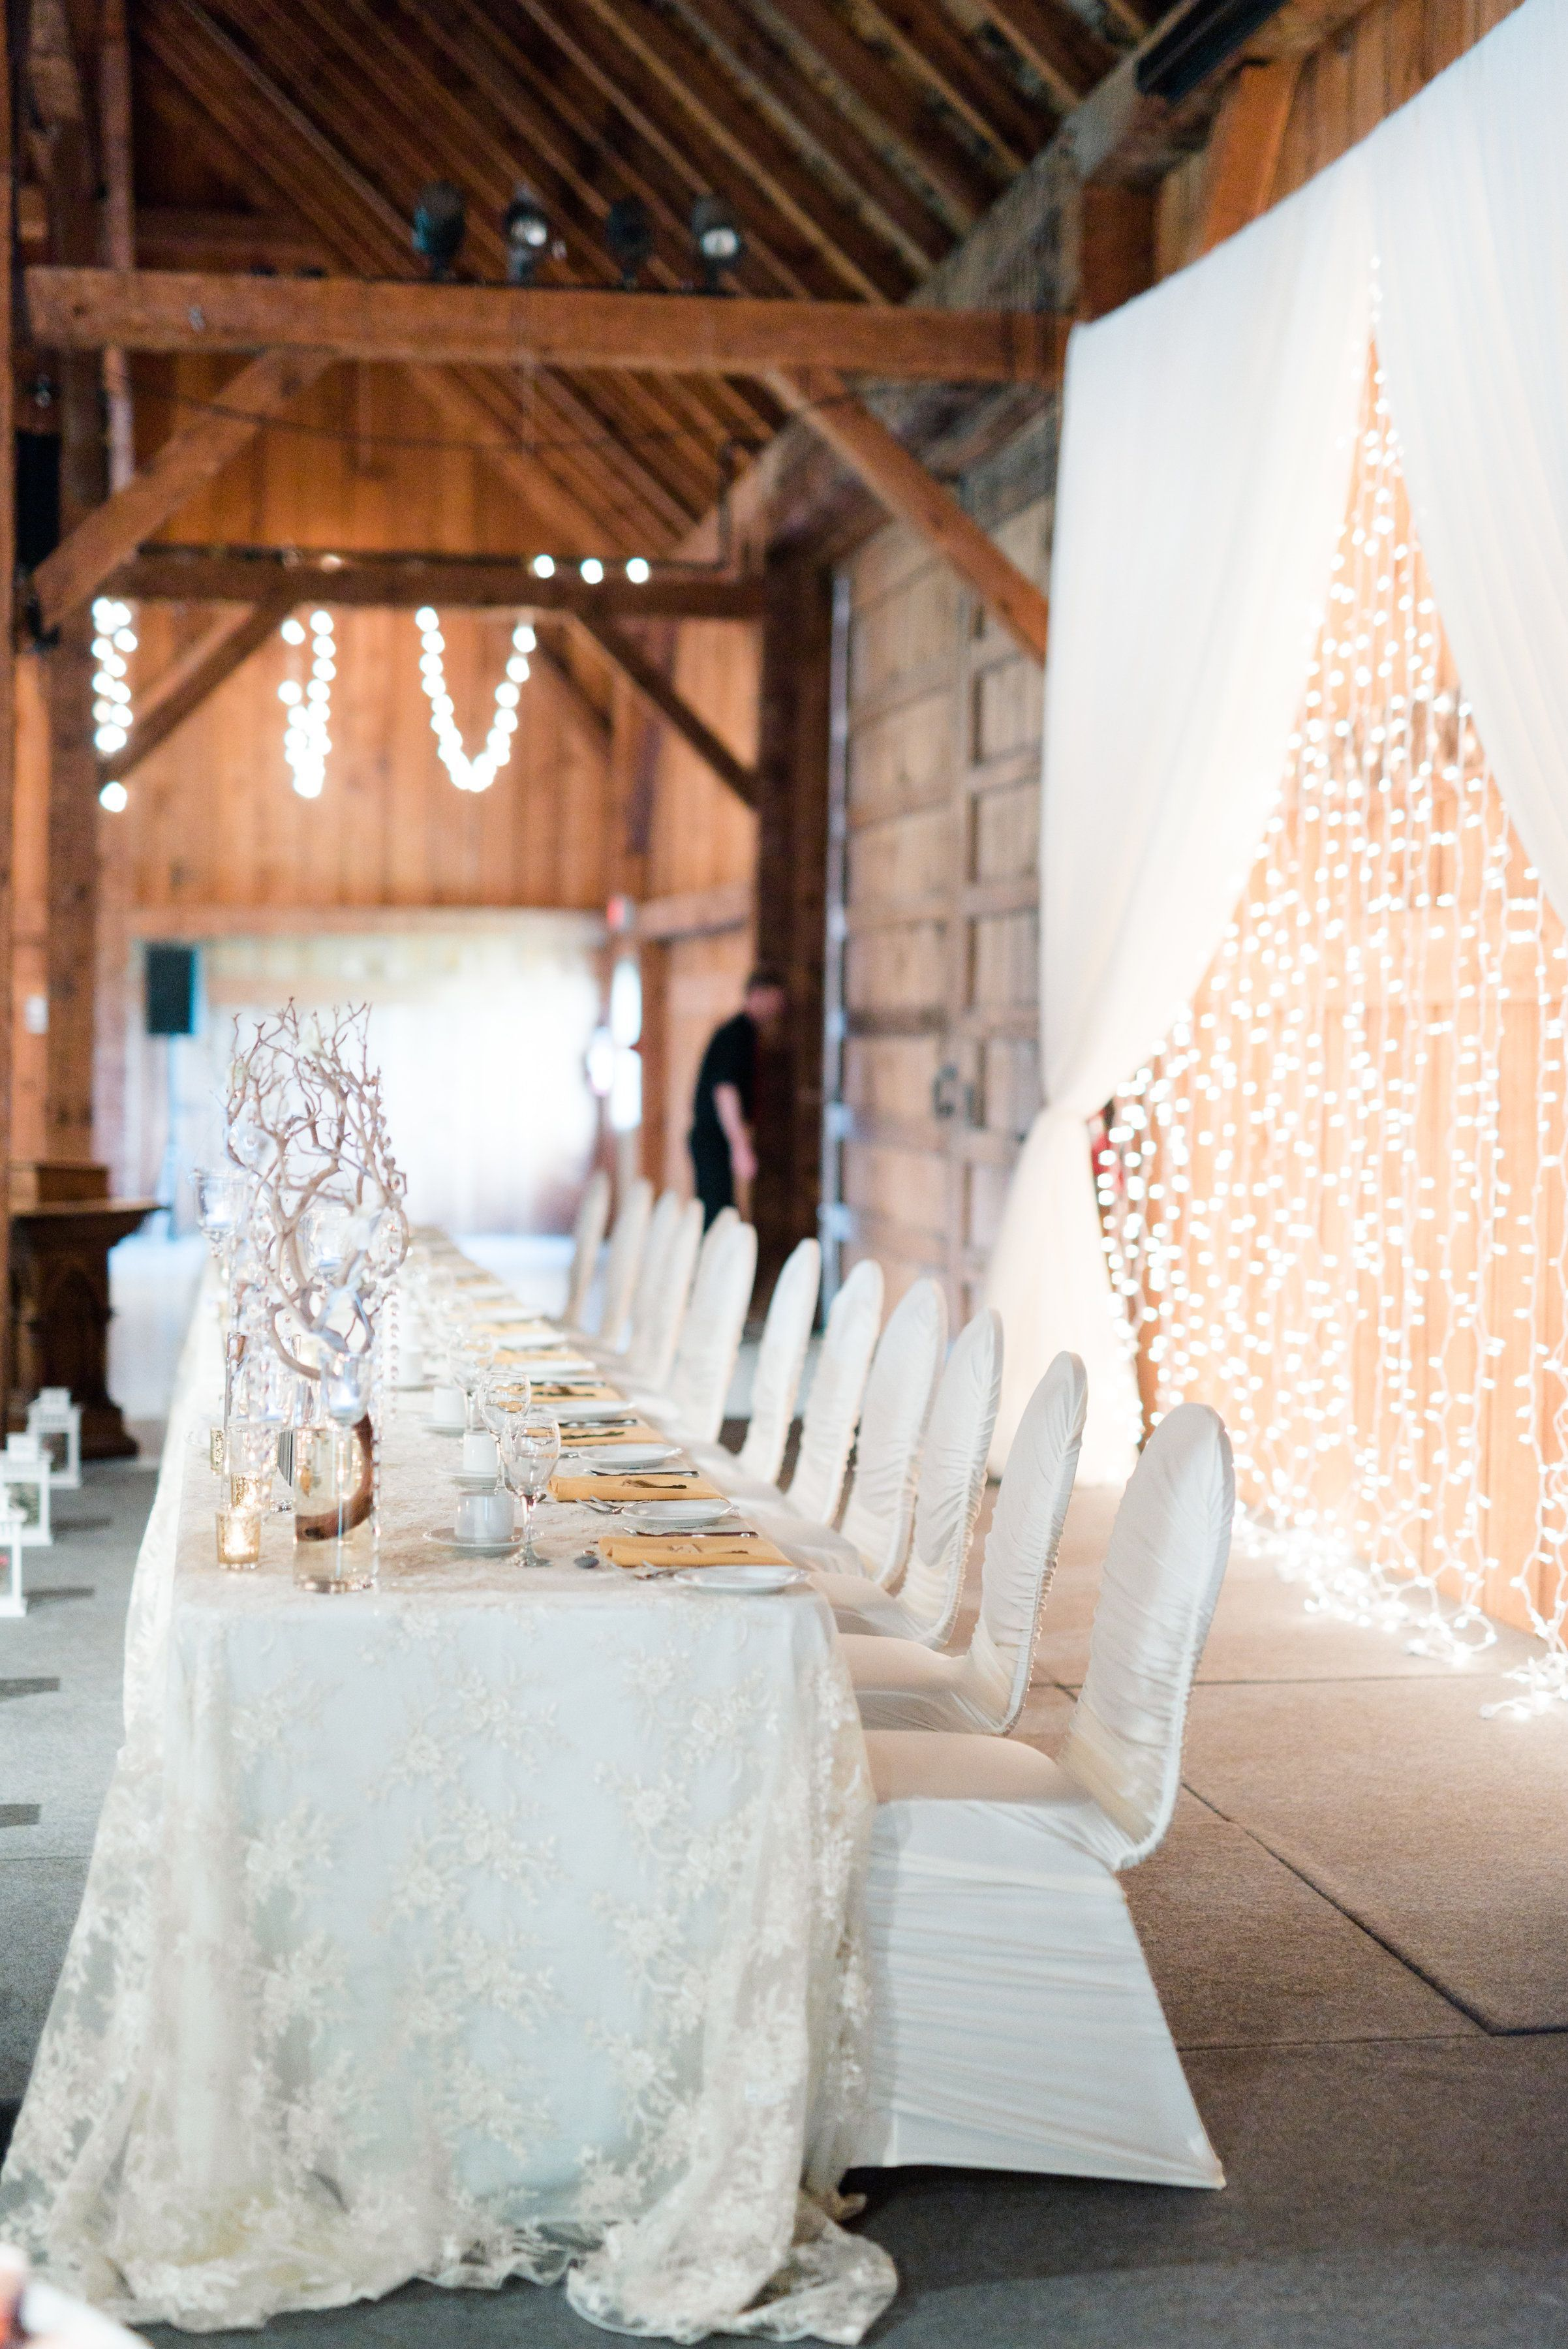 Wedding decorations 2019  Wedding Decor Barn wedding rustic wedding twinkle lighting